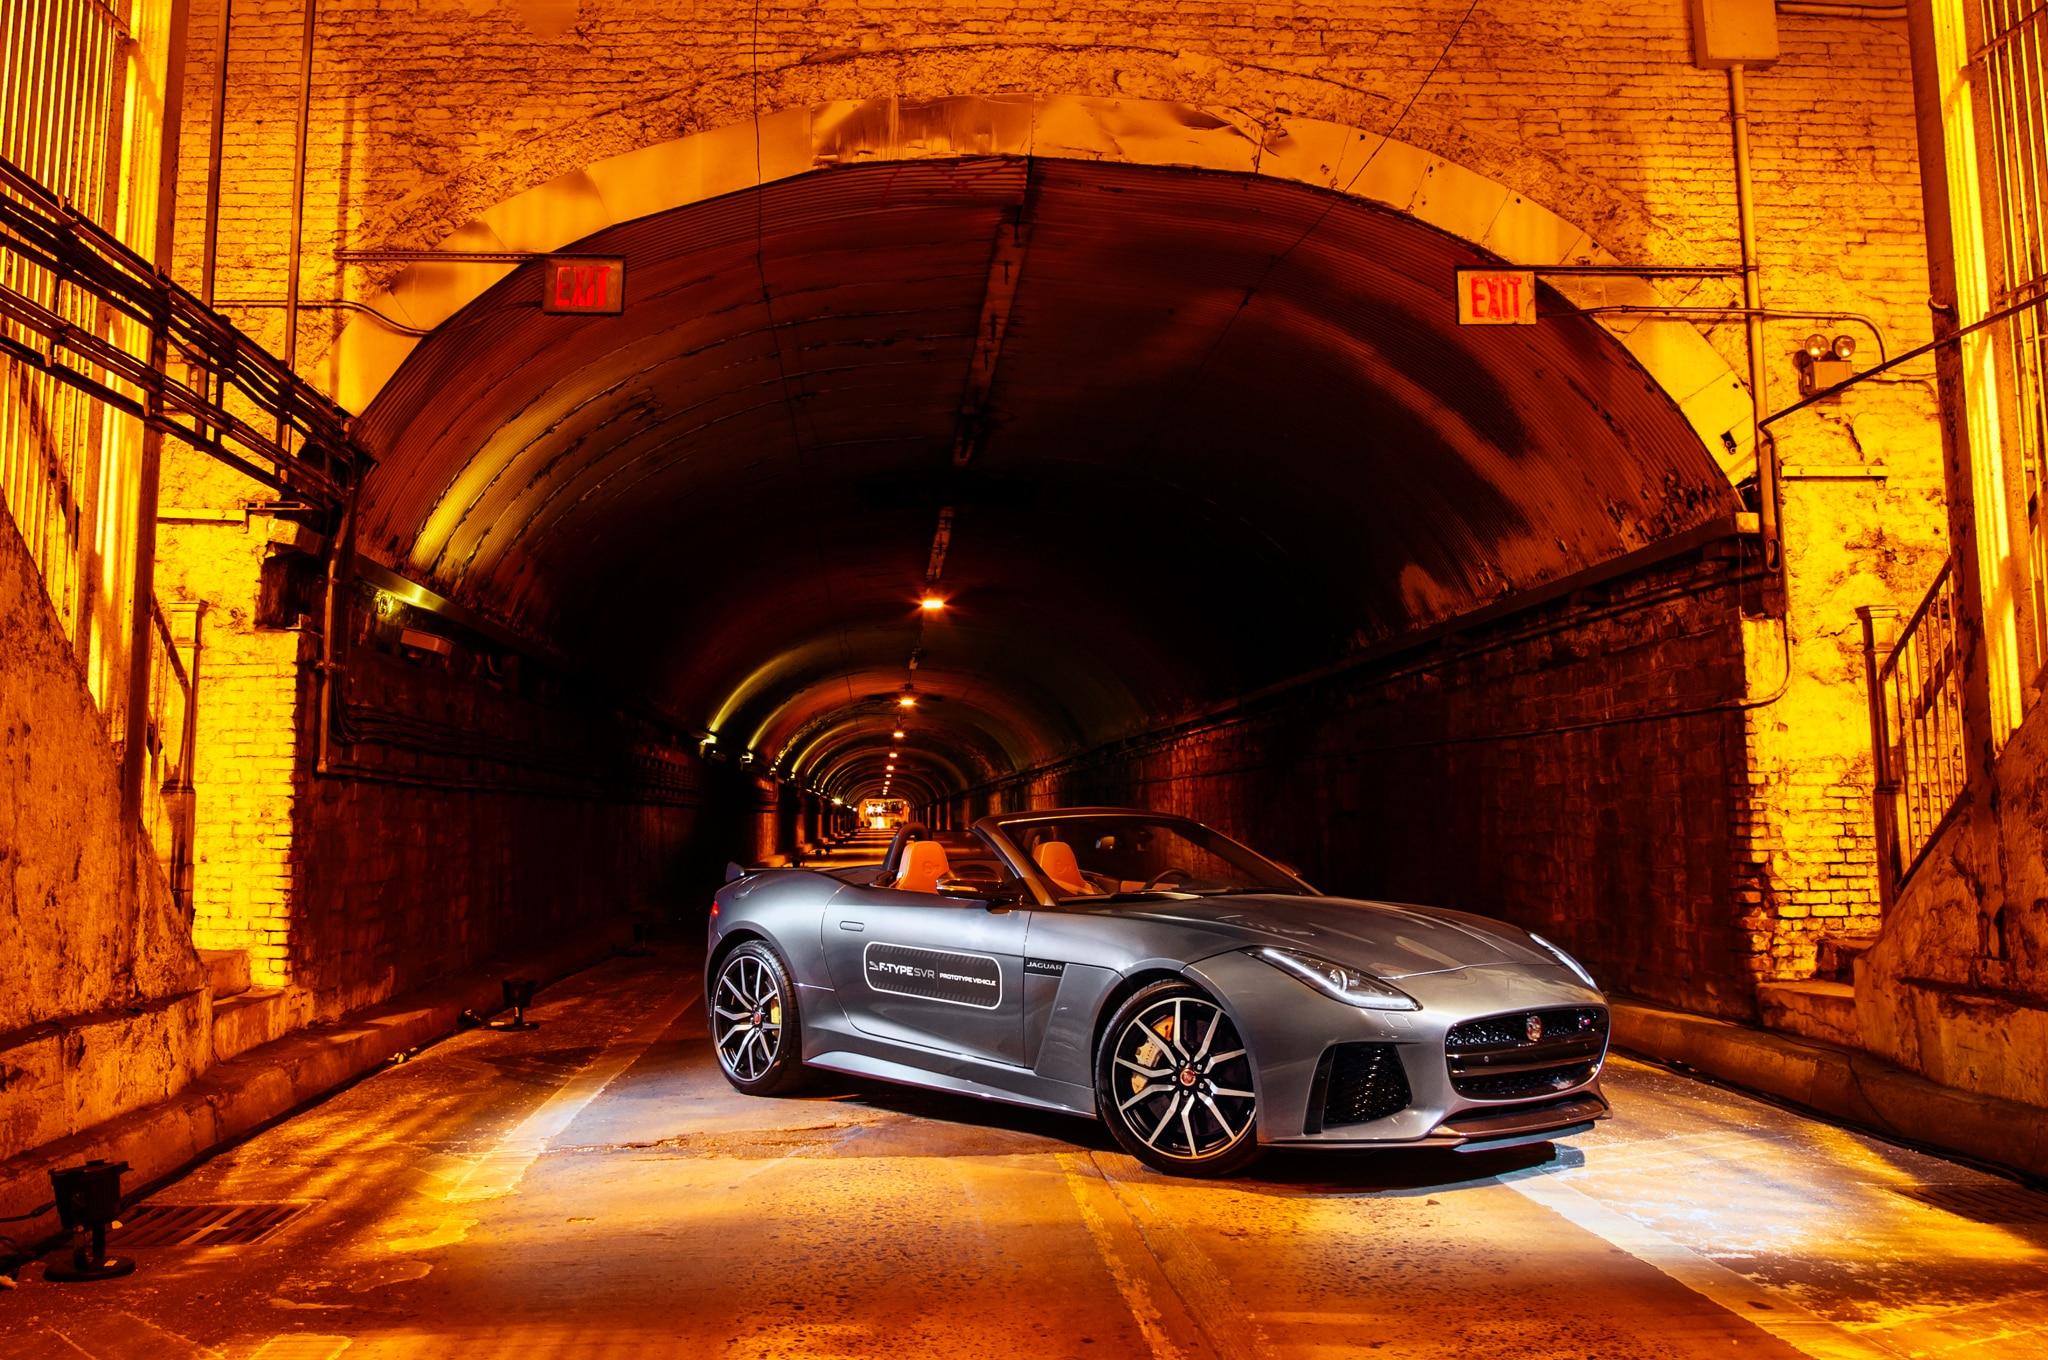 2017 Jaguar F Type SVR Convertible Front Three Quarter 02